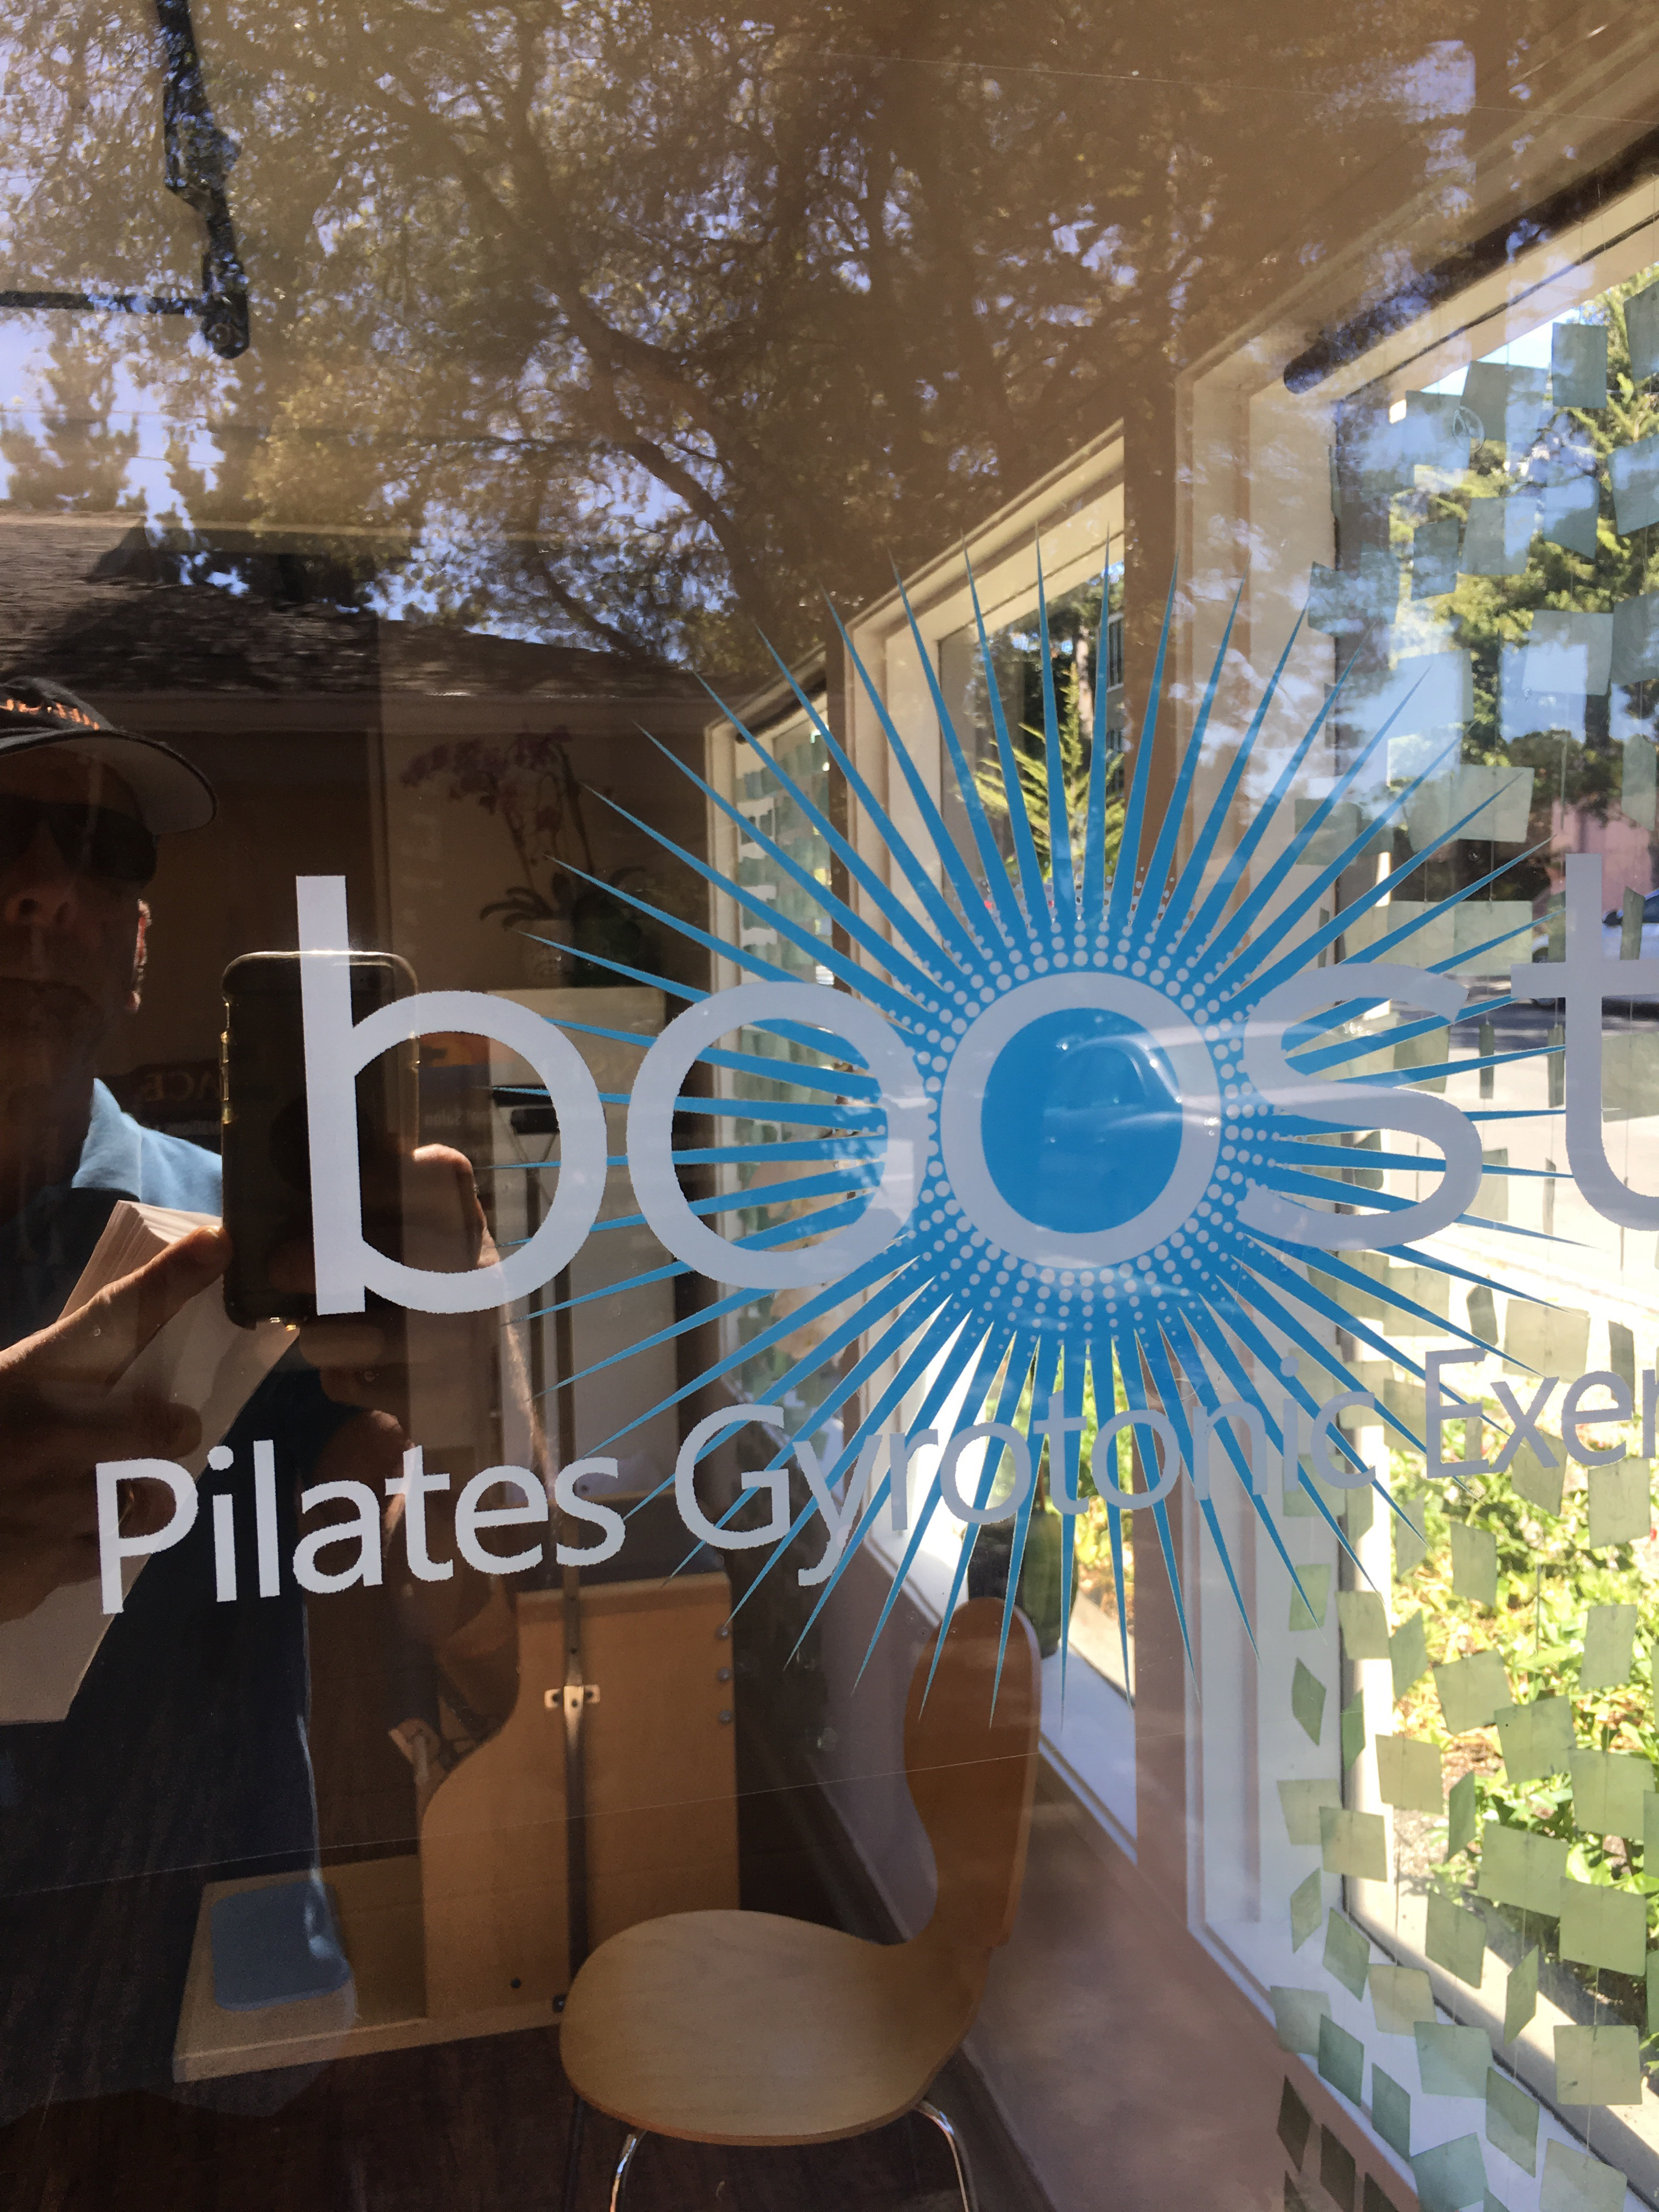 Bost Pilates Studio